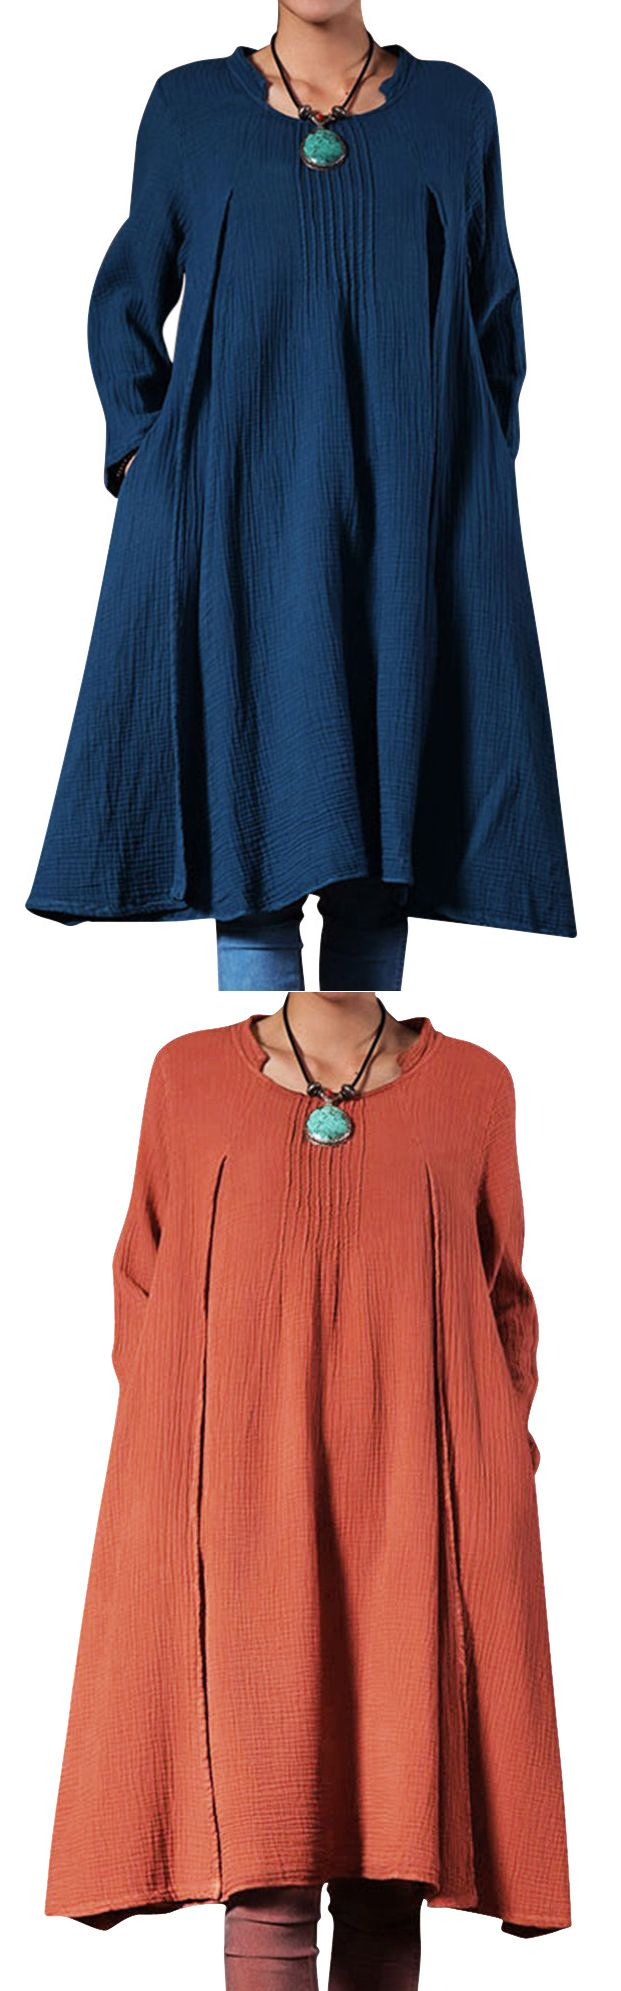 O-Newe Loose Pure Color Long Sleeve Ruffled Dress